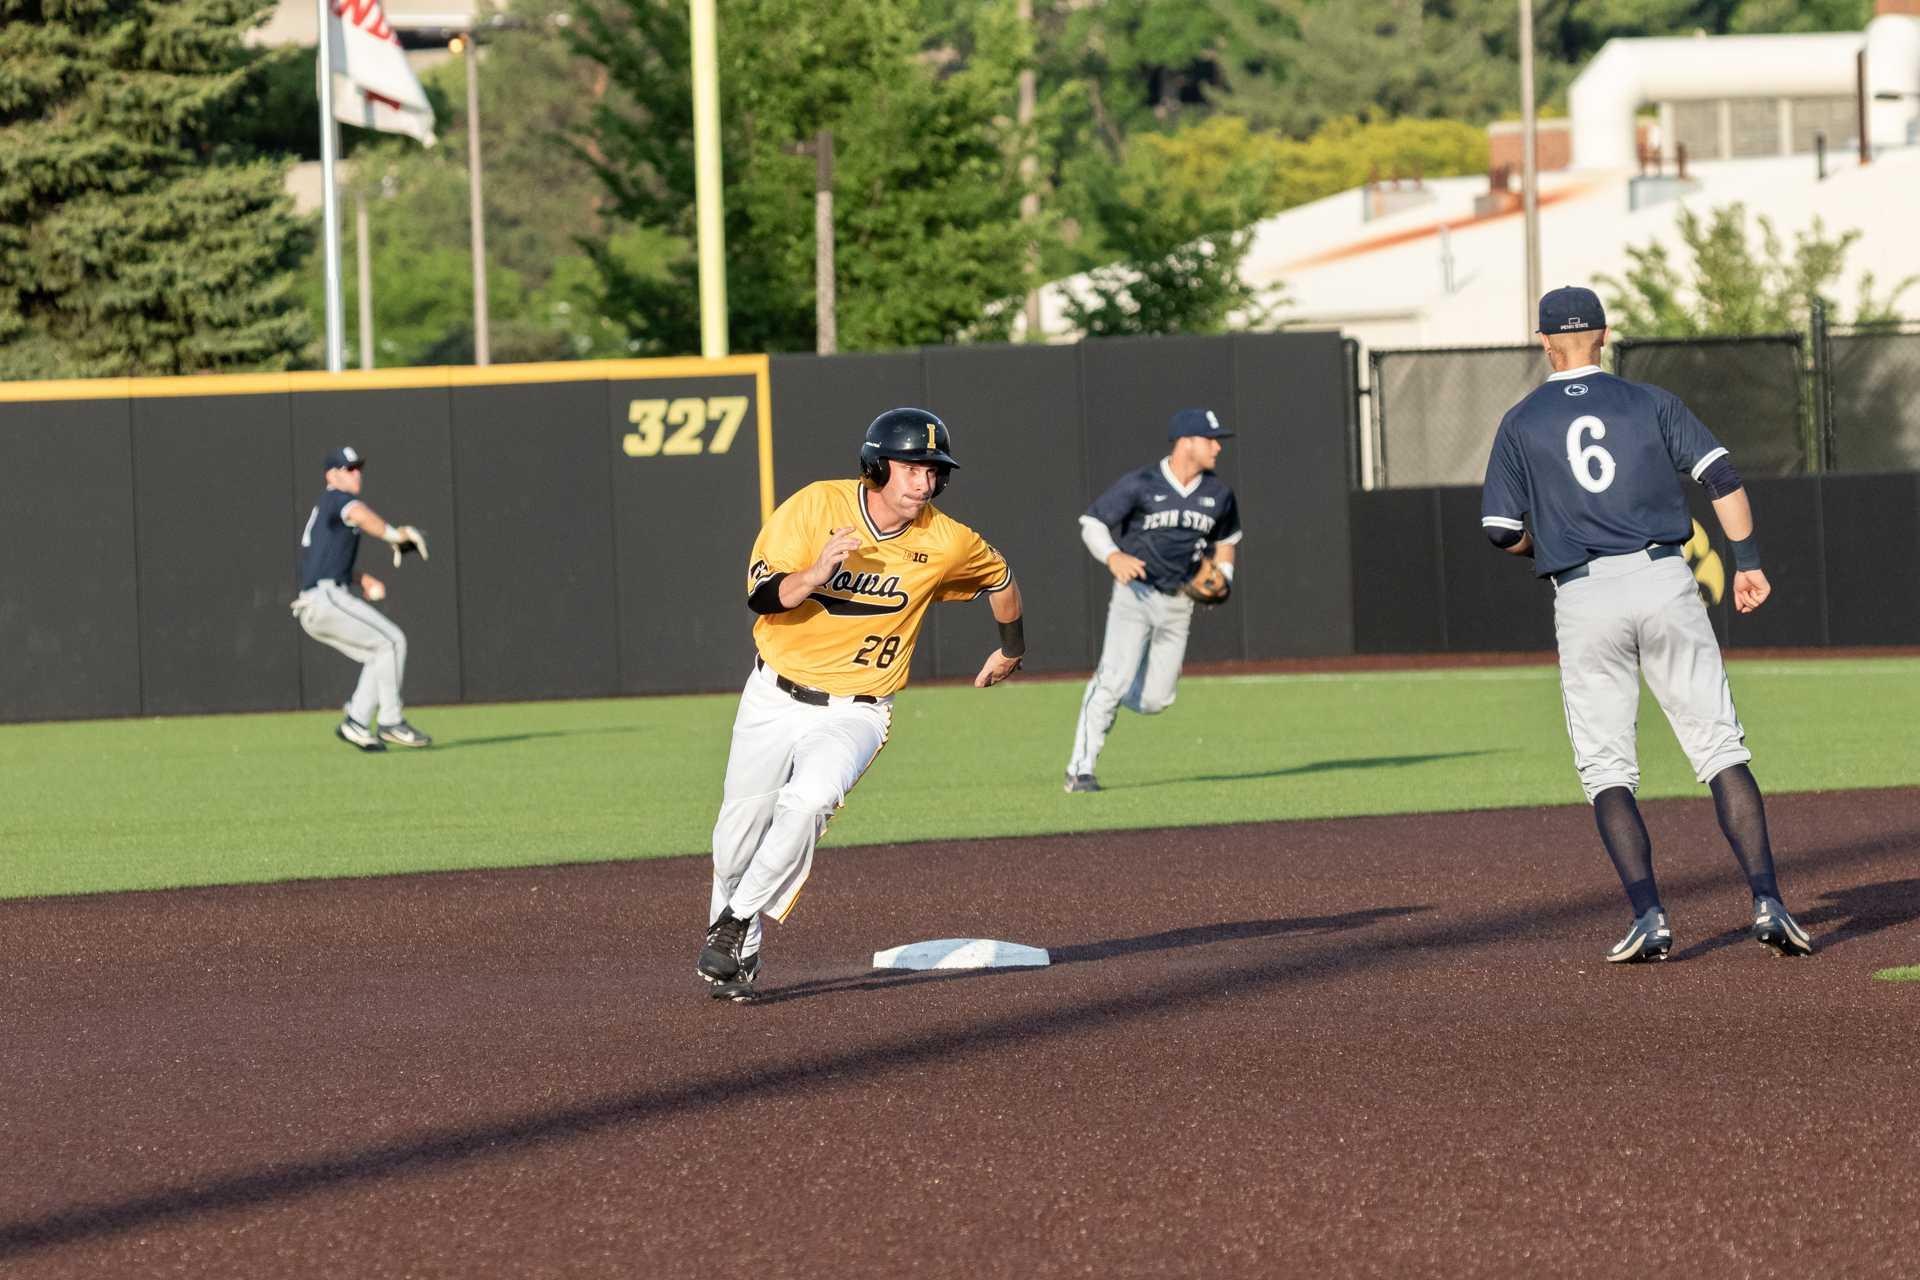 Iowa baseball's Whelan takes on leadership role